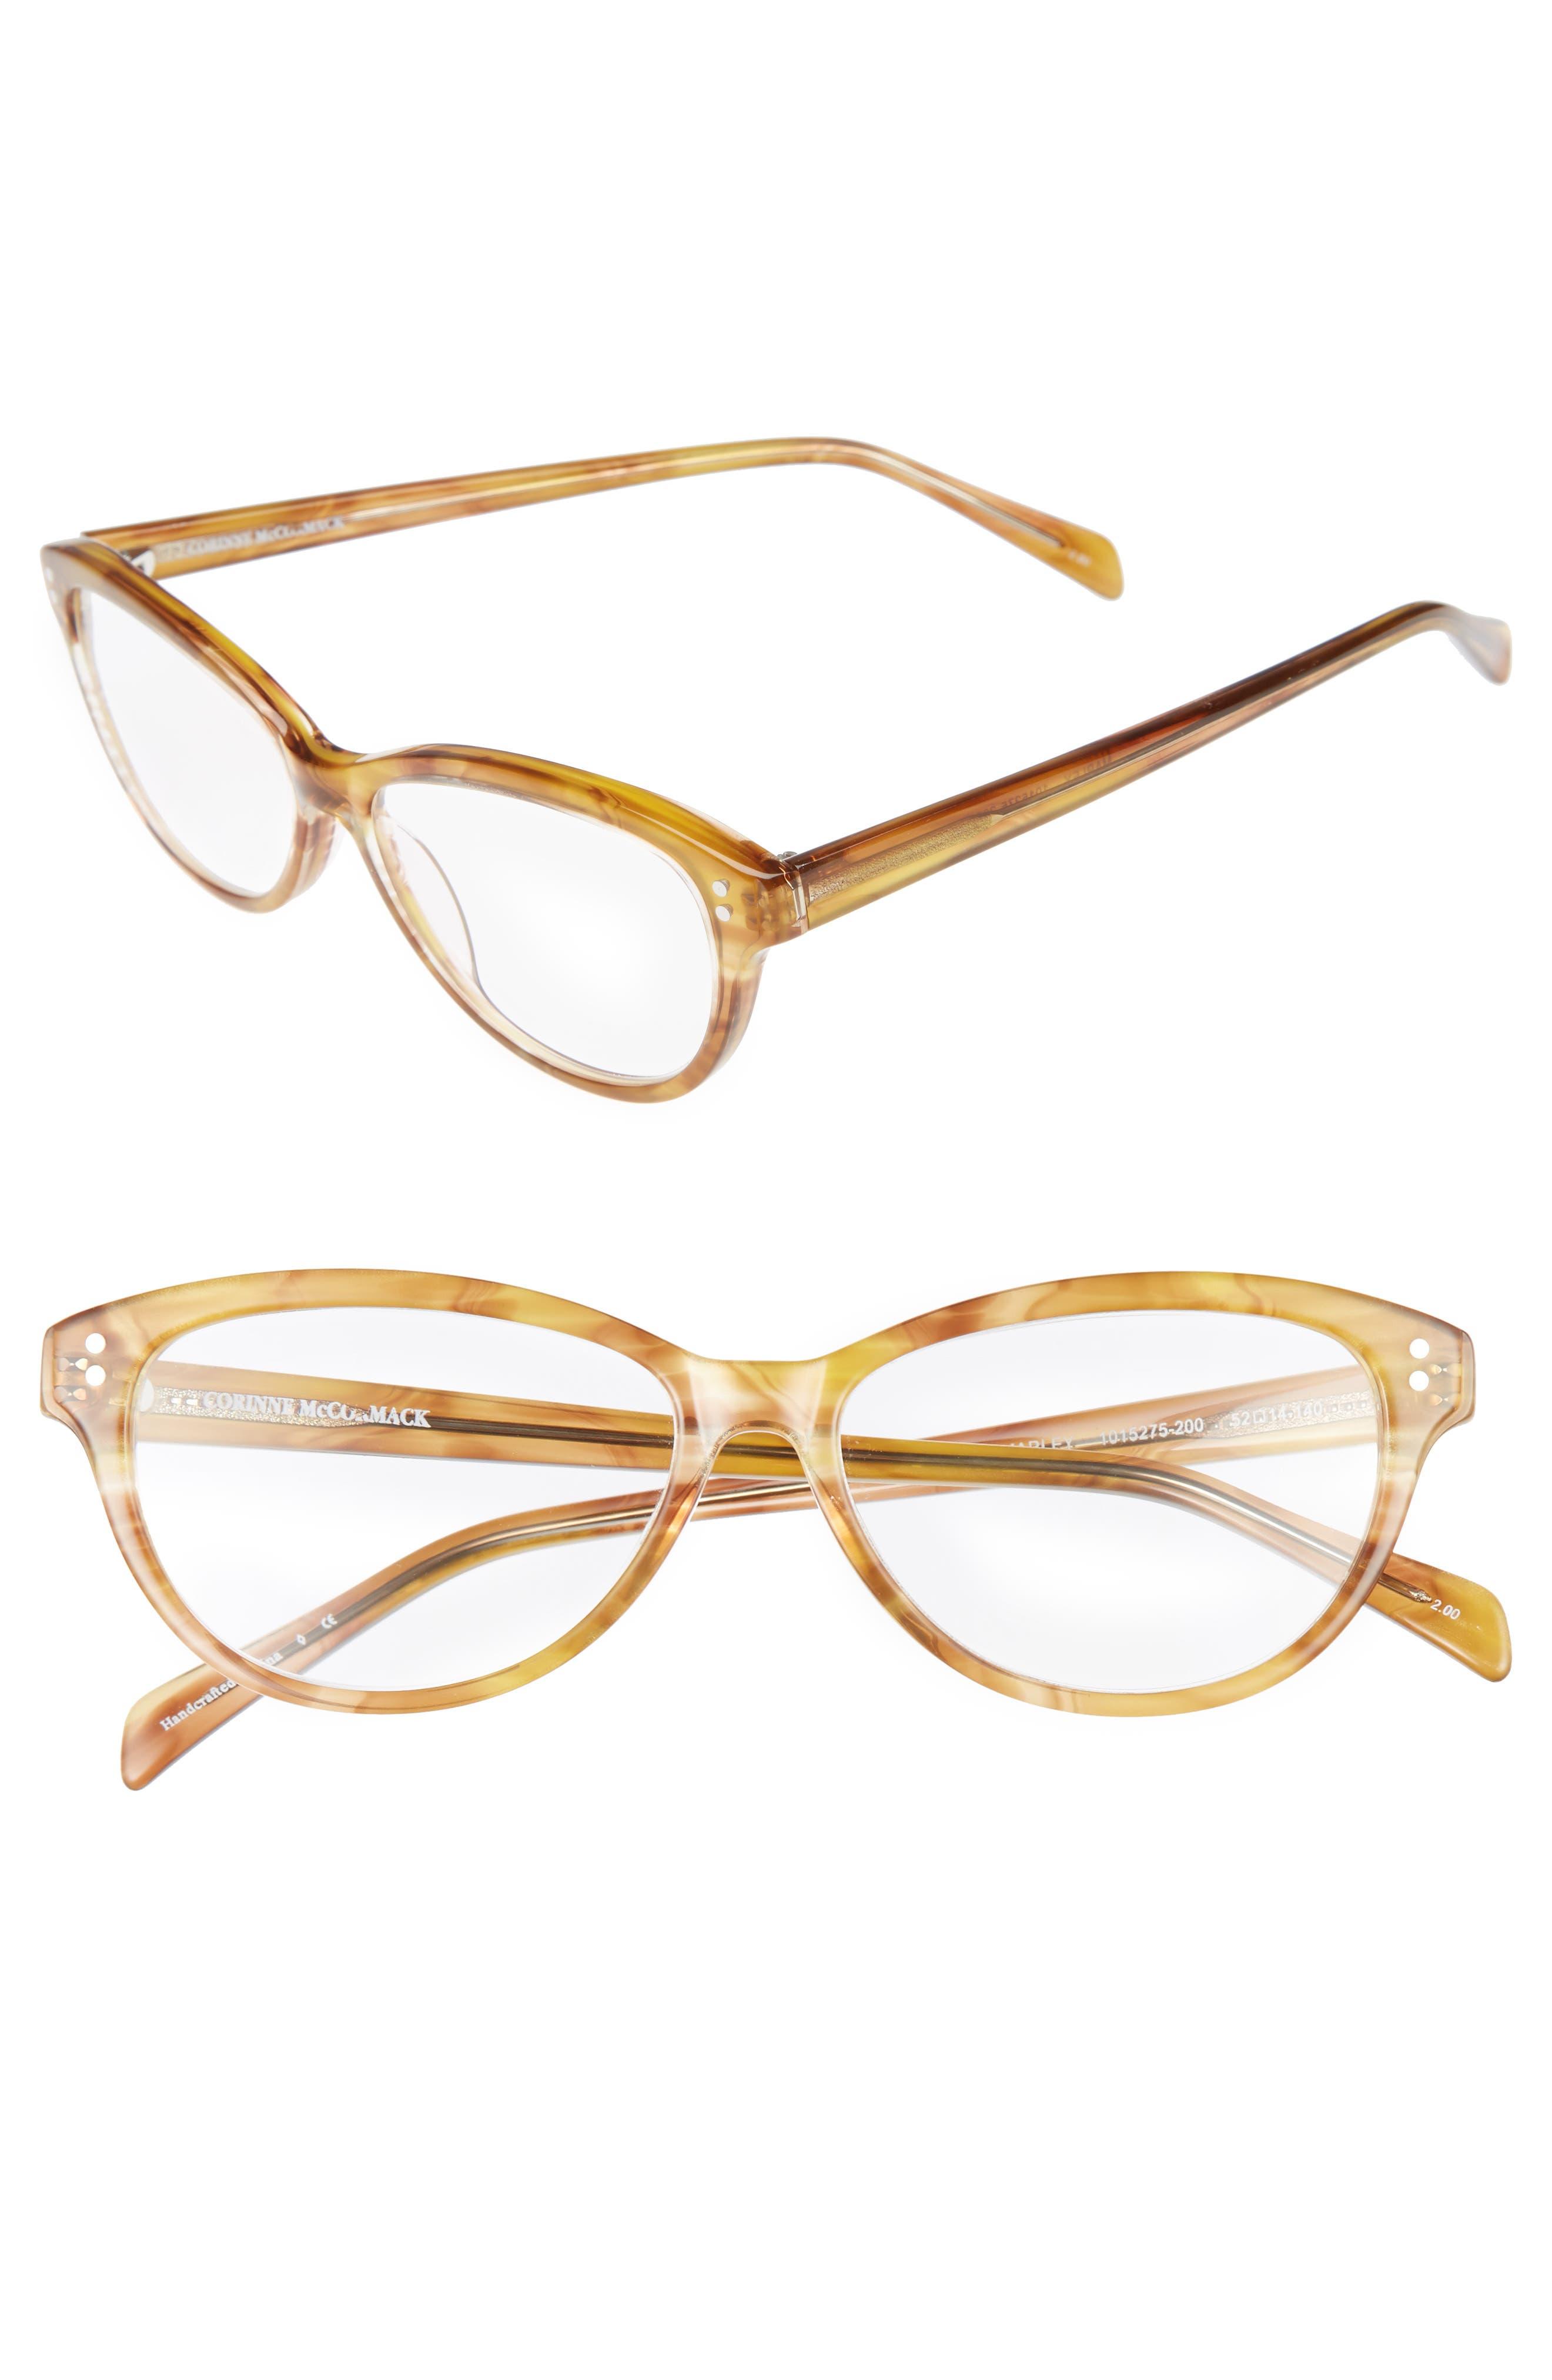 Alternate Image 1 Selected - Corinne McCormack Marley 52mm Reading Glasses